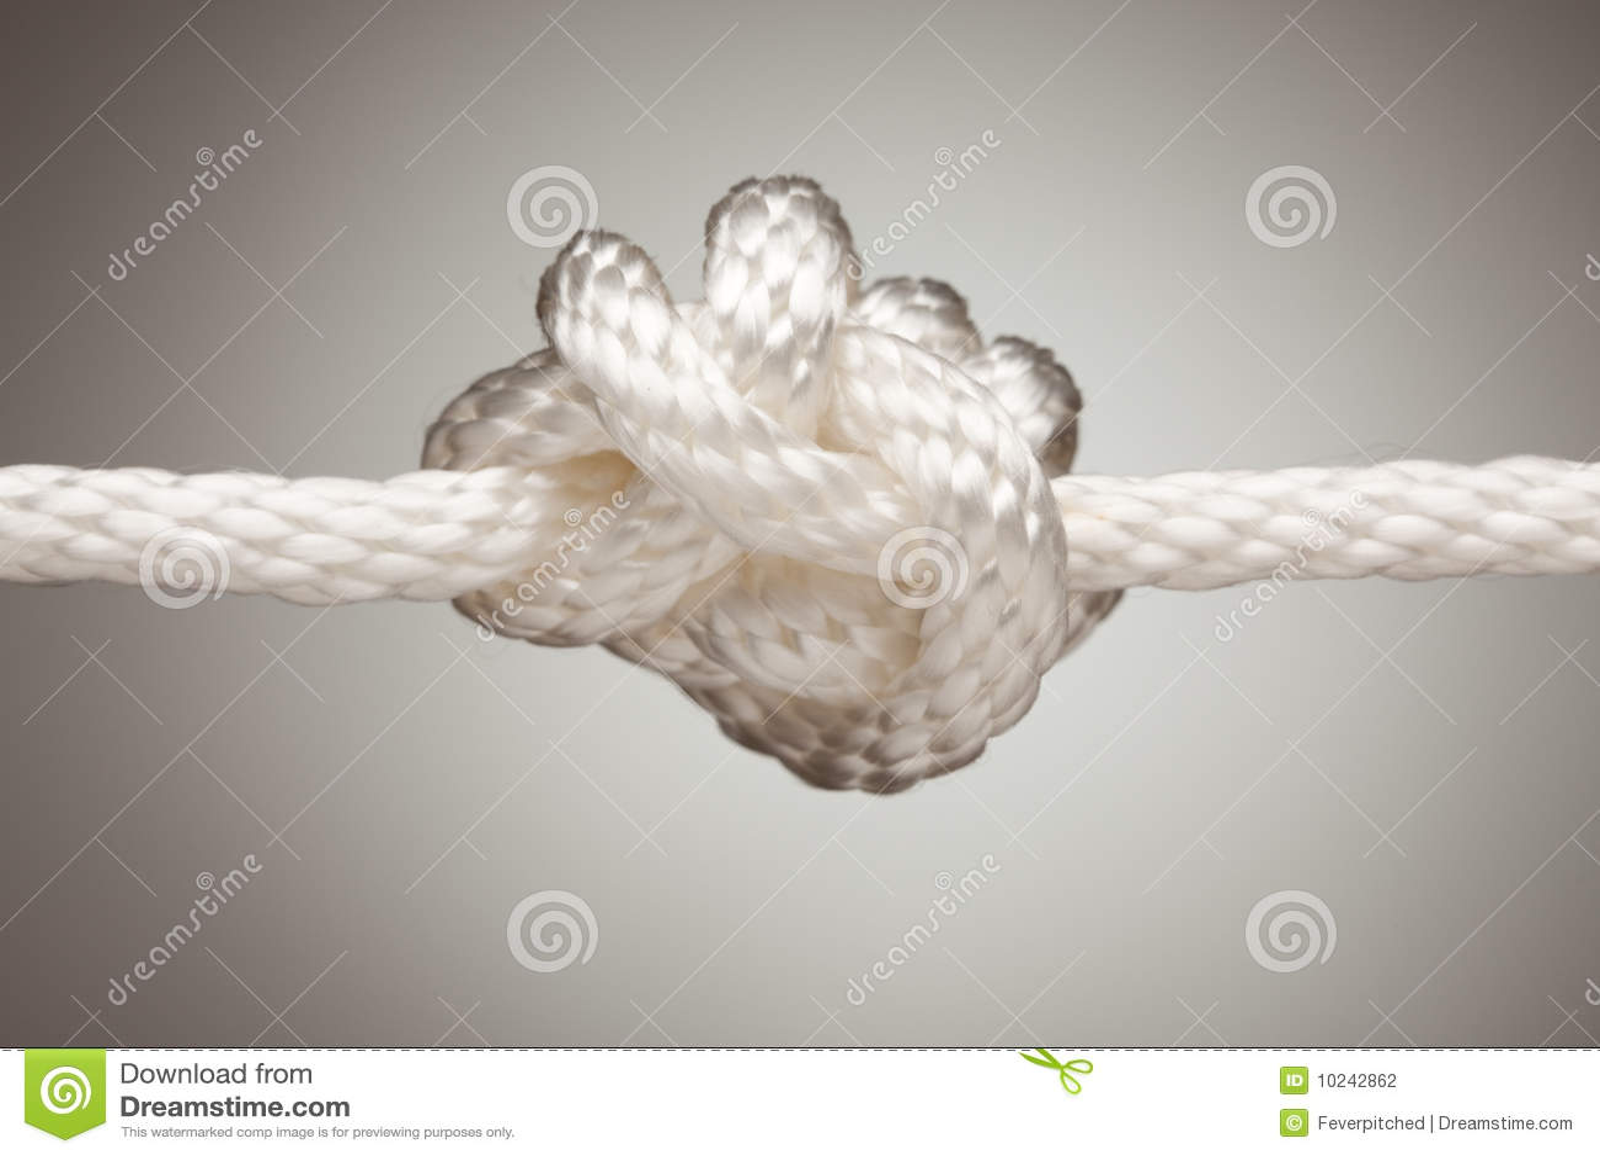 knots for nylon rope